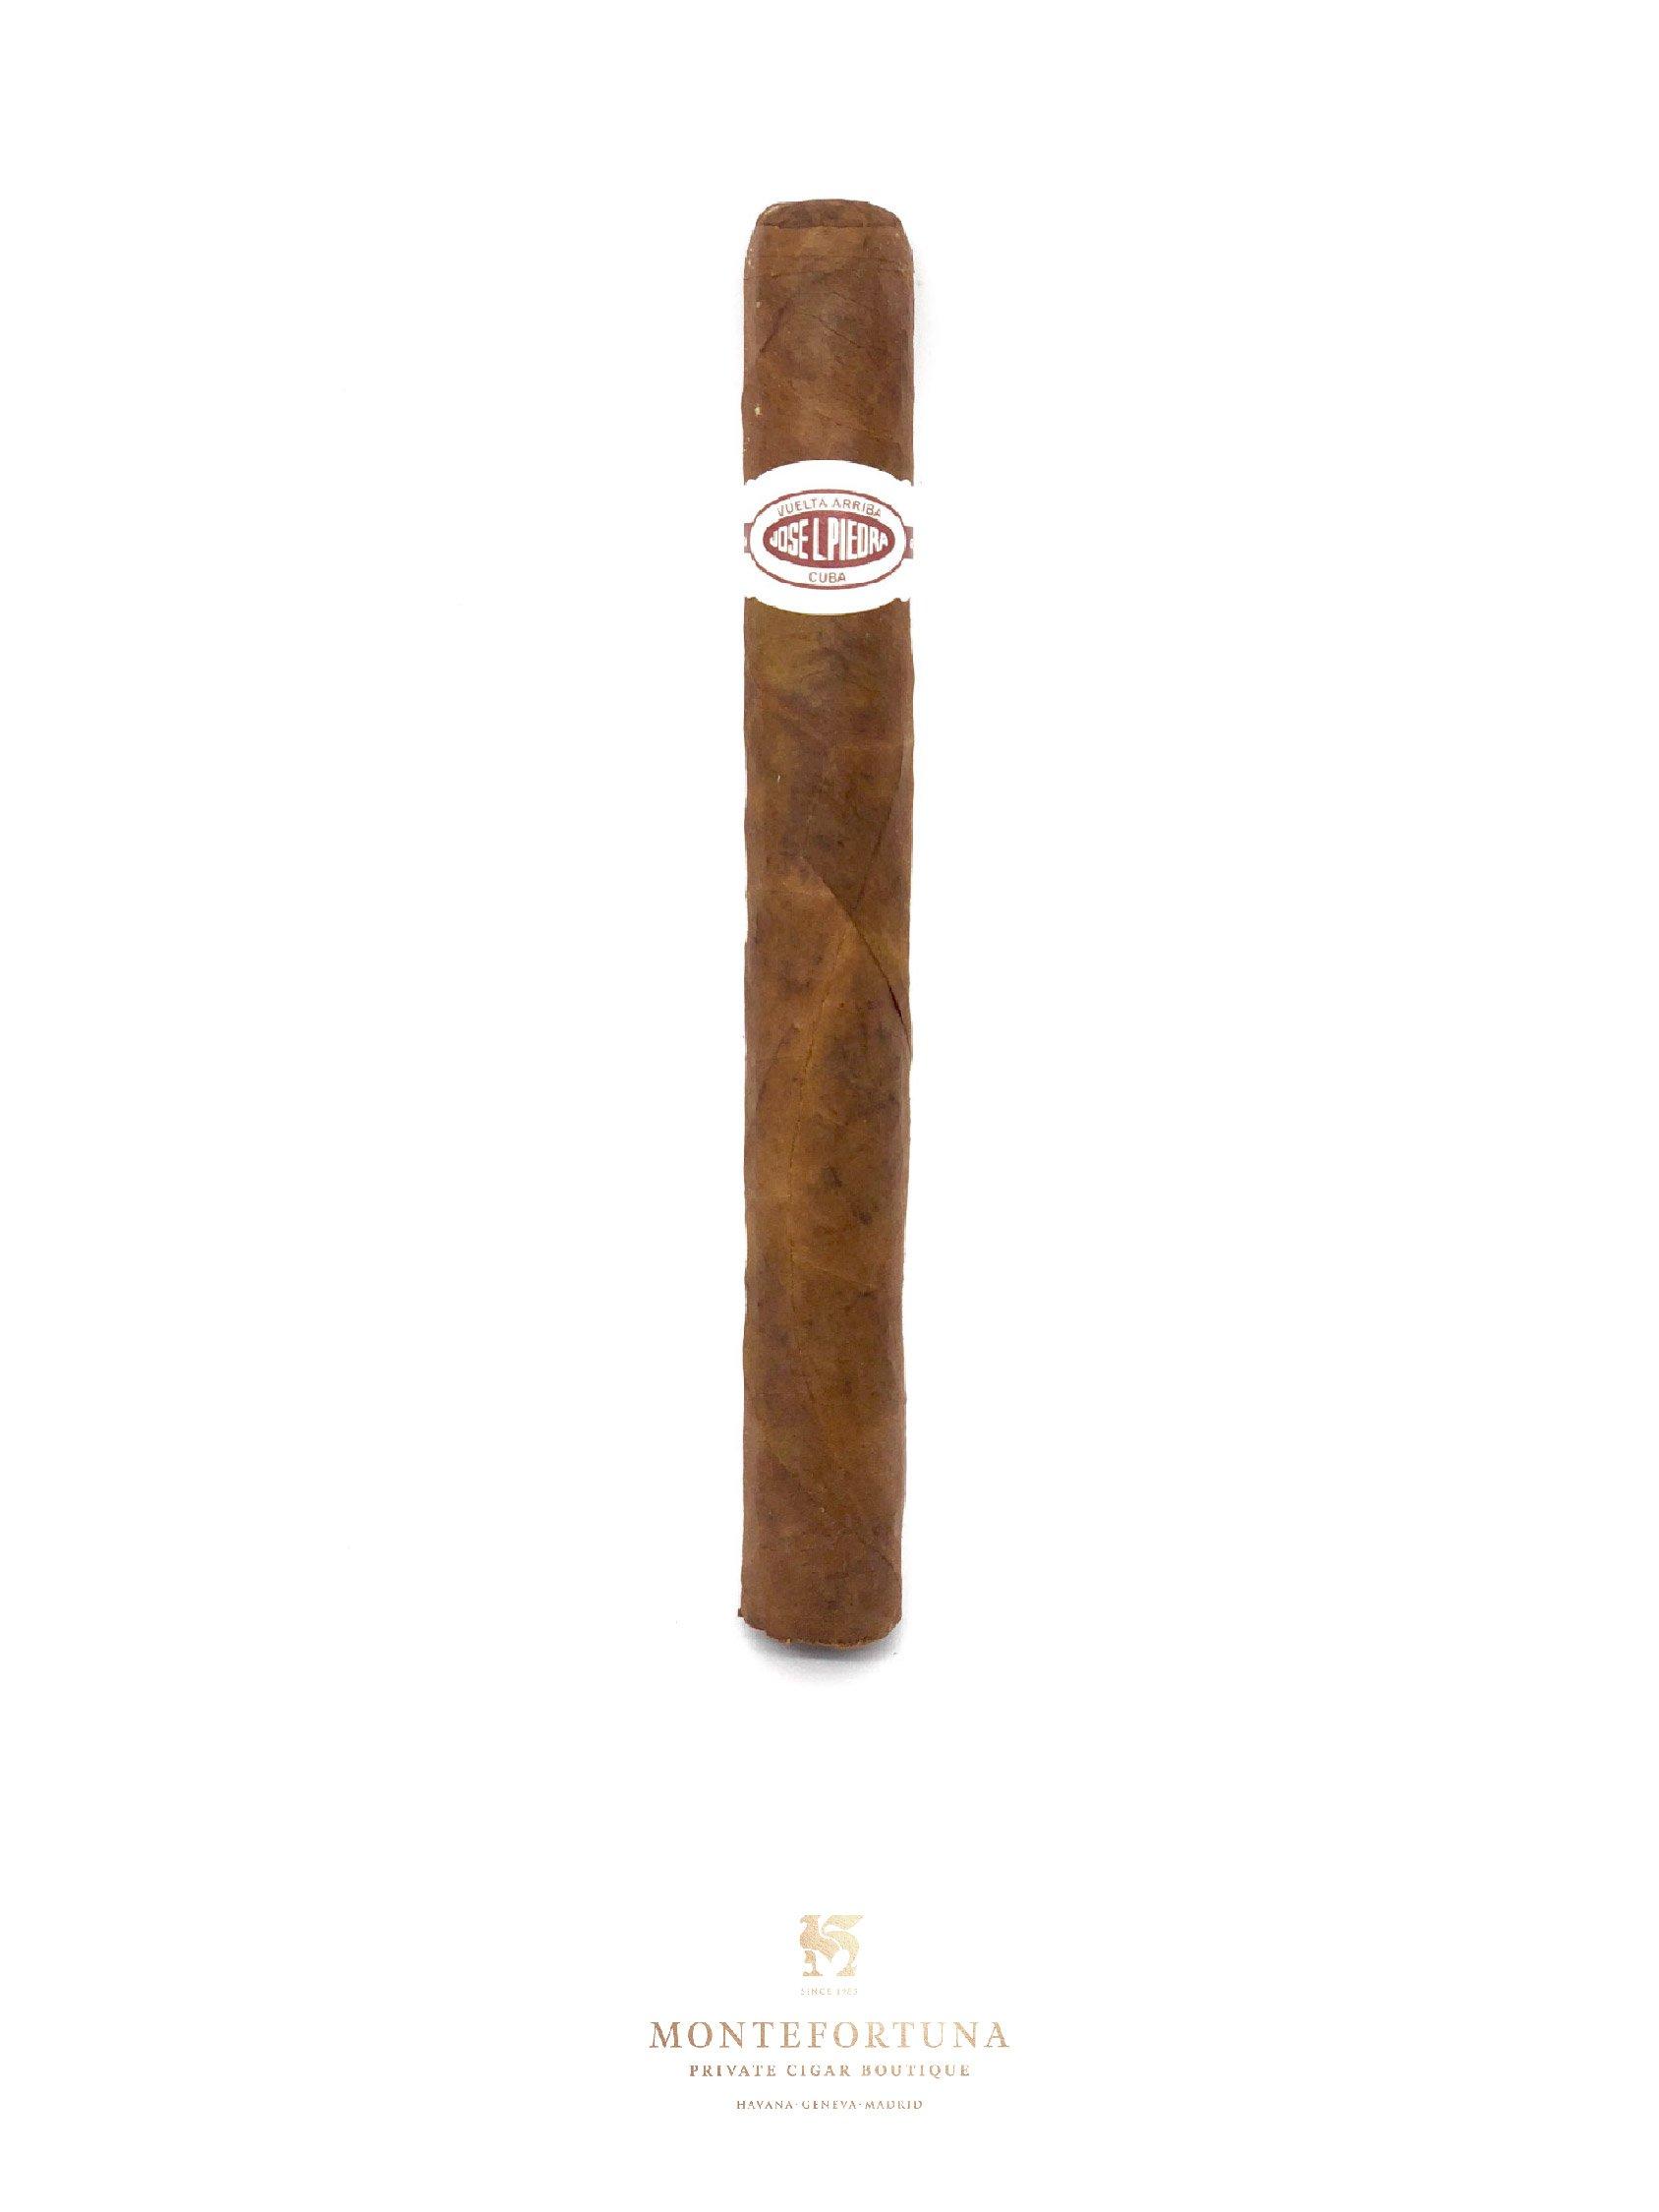 top 5 cigars under 10$ the best cheap cuban cigars montefortunaprice 4\u20ac jose l piedra cazadores cheap cuban cigars